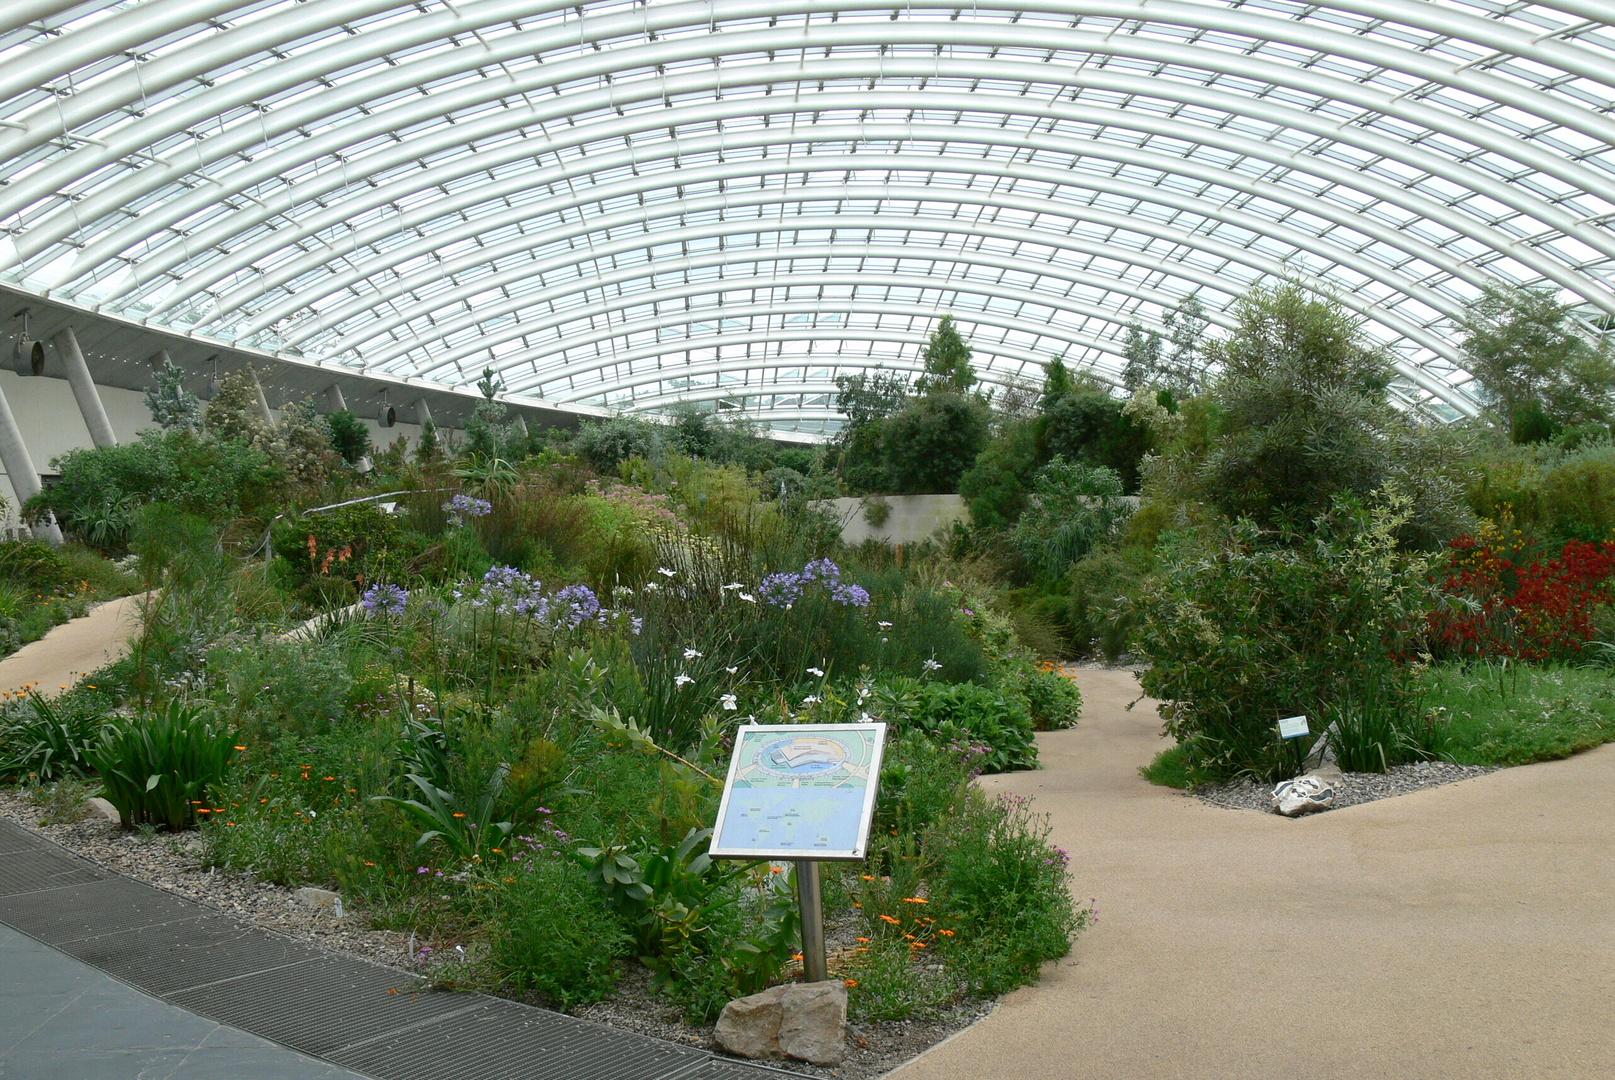 National Botanic Garden of Wales XV